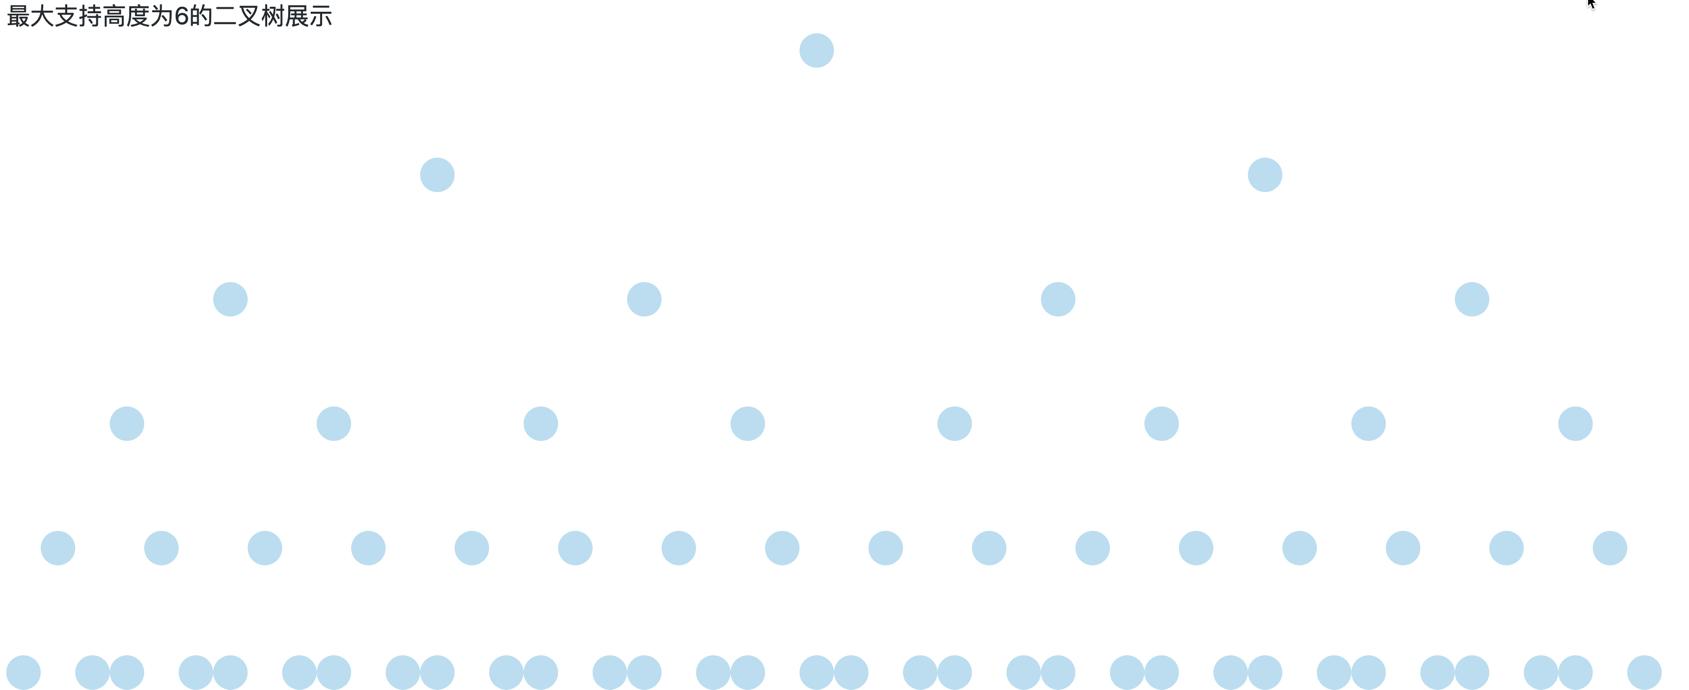 binary-tree-visualize-fail.png